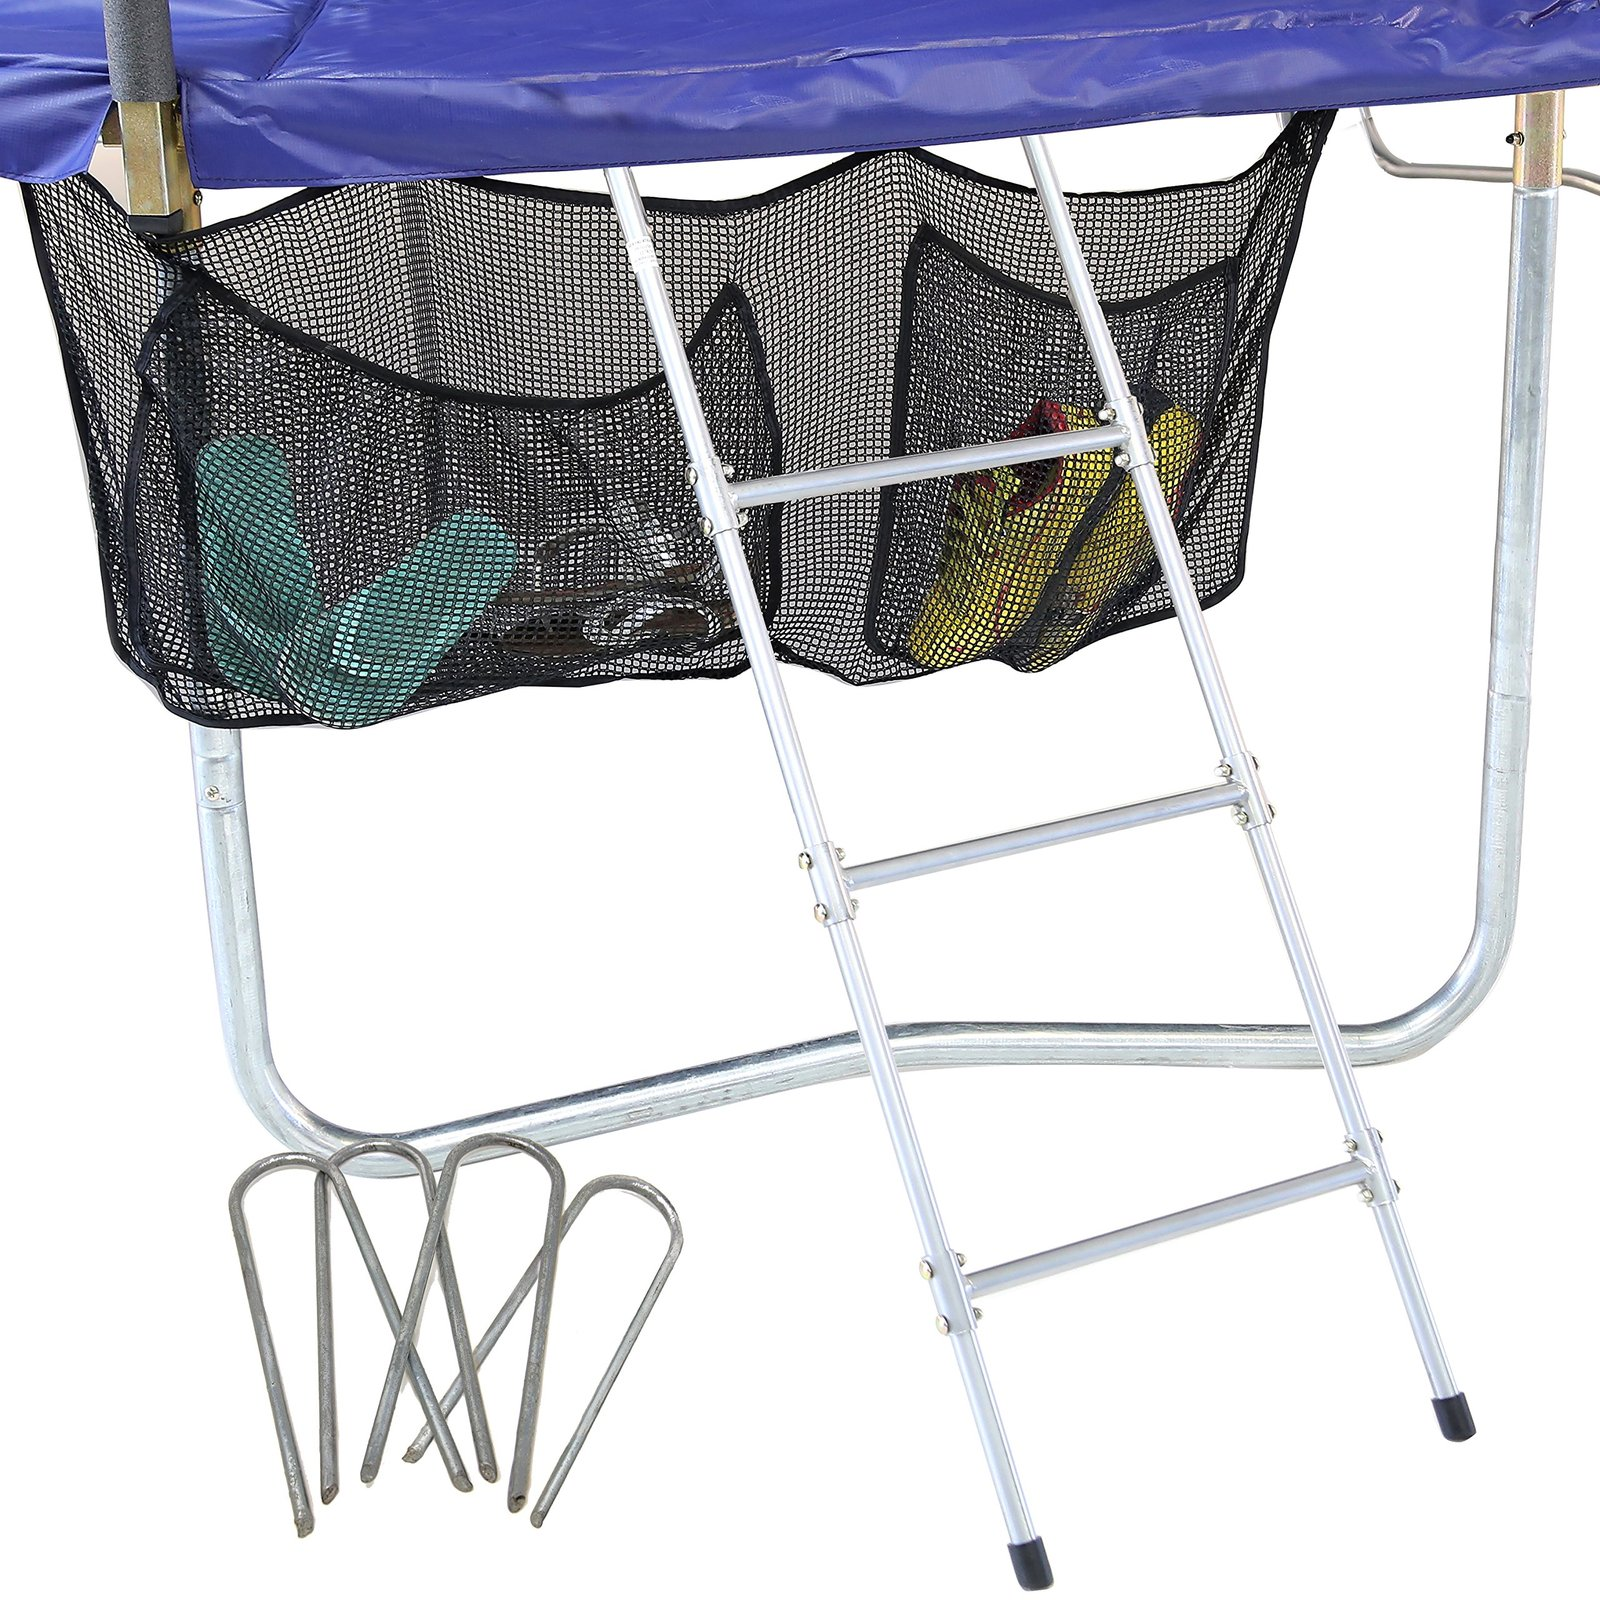 Trampoline Parts Center Coupon Code: Skywalker Trampolines Trampoline Accessory Kit